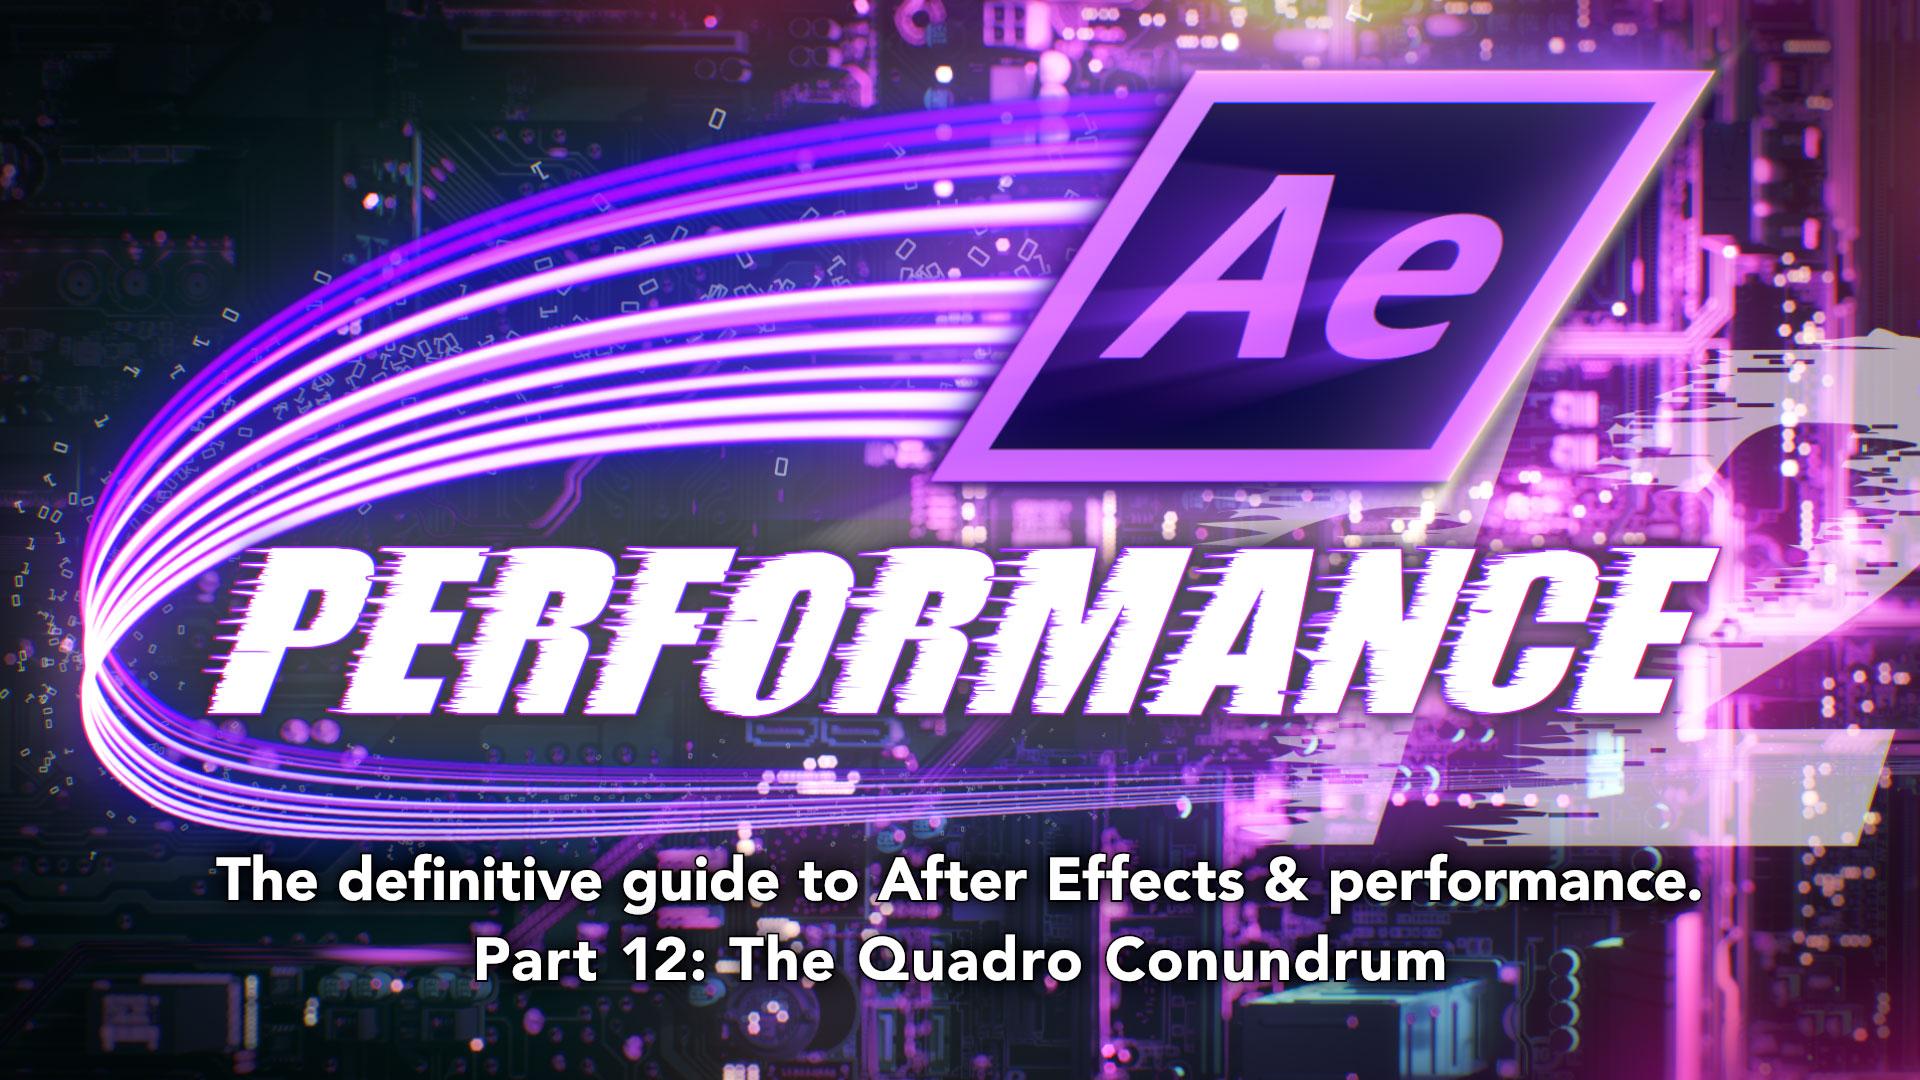 pvc_zwar_aeperformance_featureimage_12